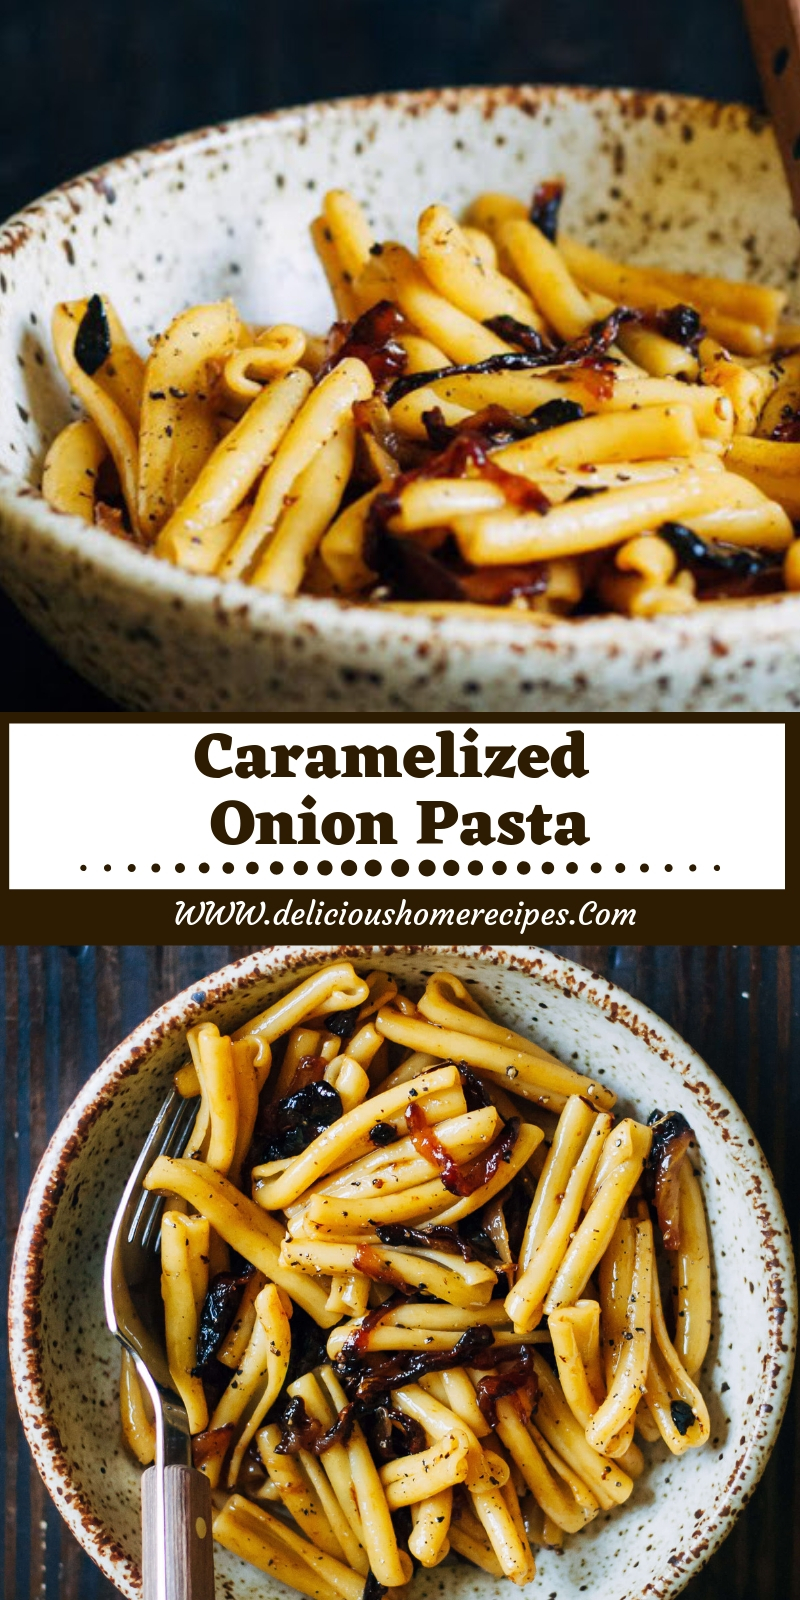 Caramelized Onion Pasta